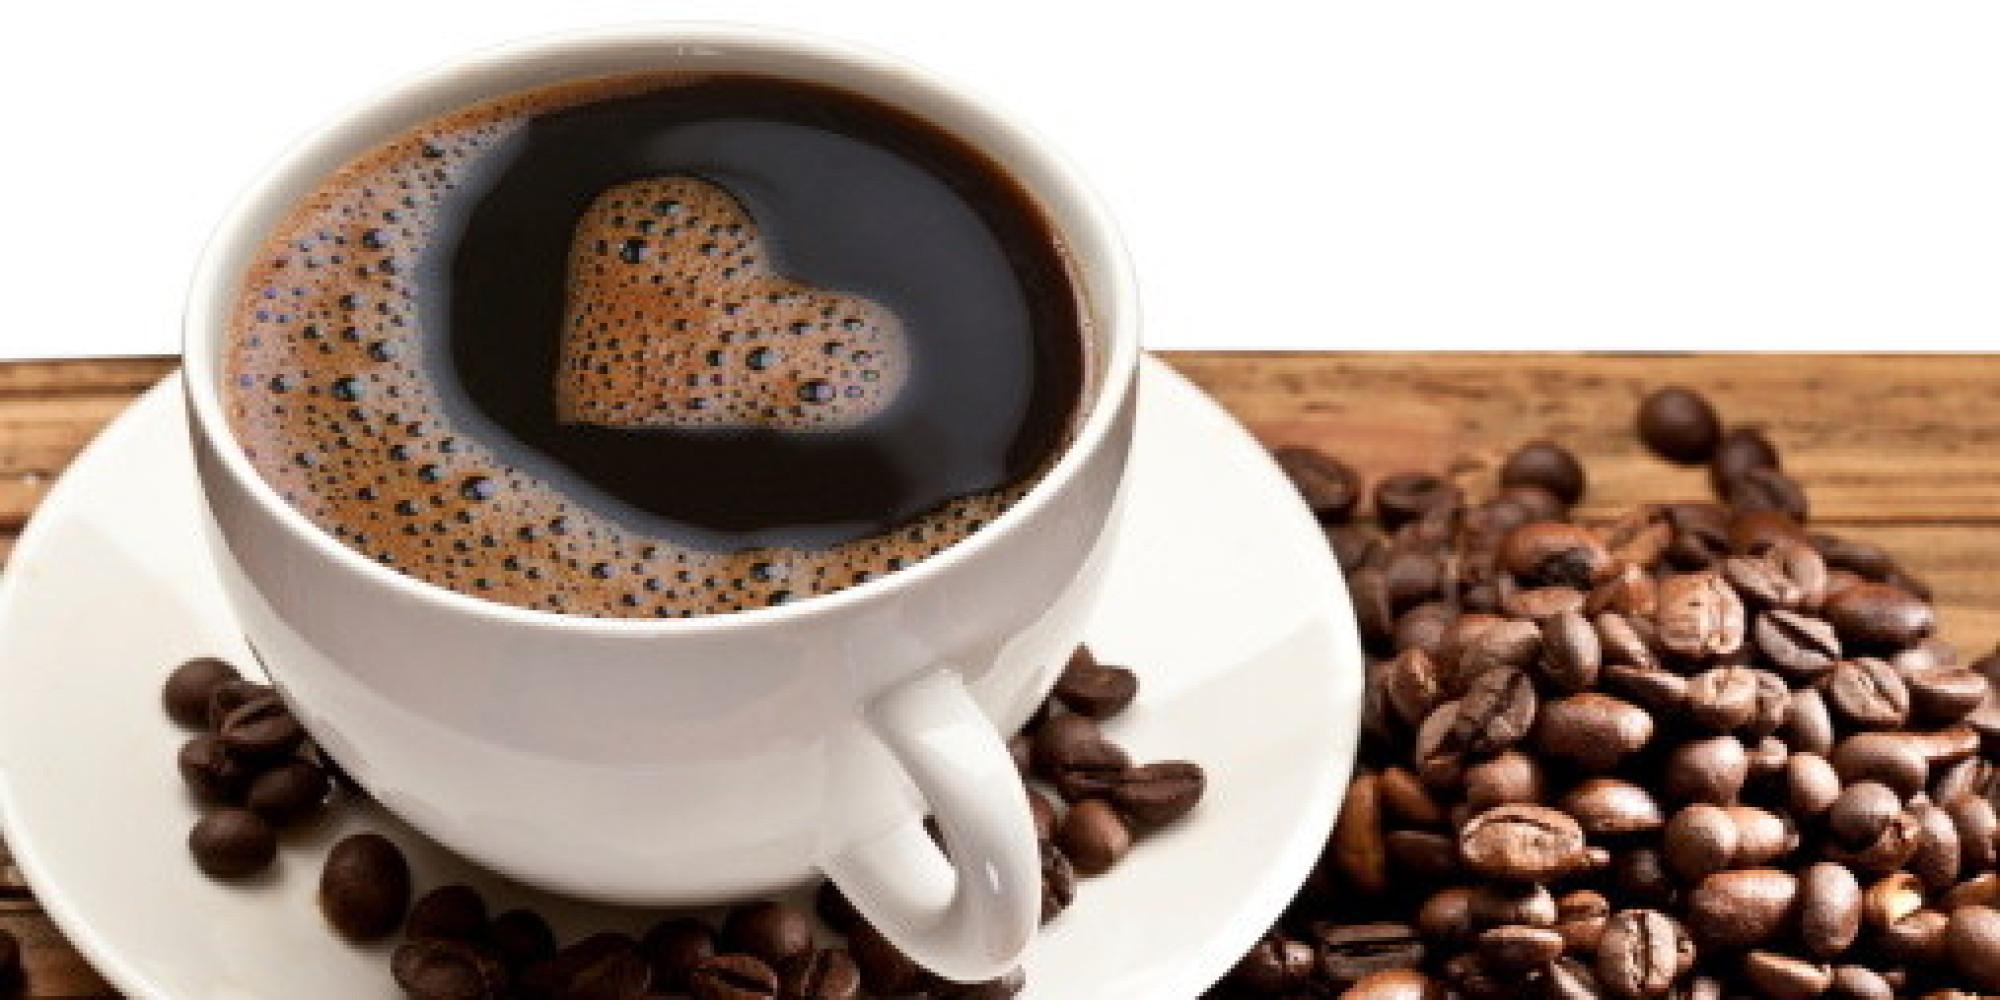 Gemutlich Kaffee Trinken In Berlin : Neue Studie legt nahe Kaffee trinken senkt das LeberkrebsRisiko